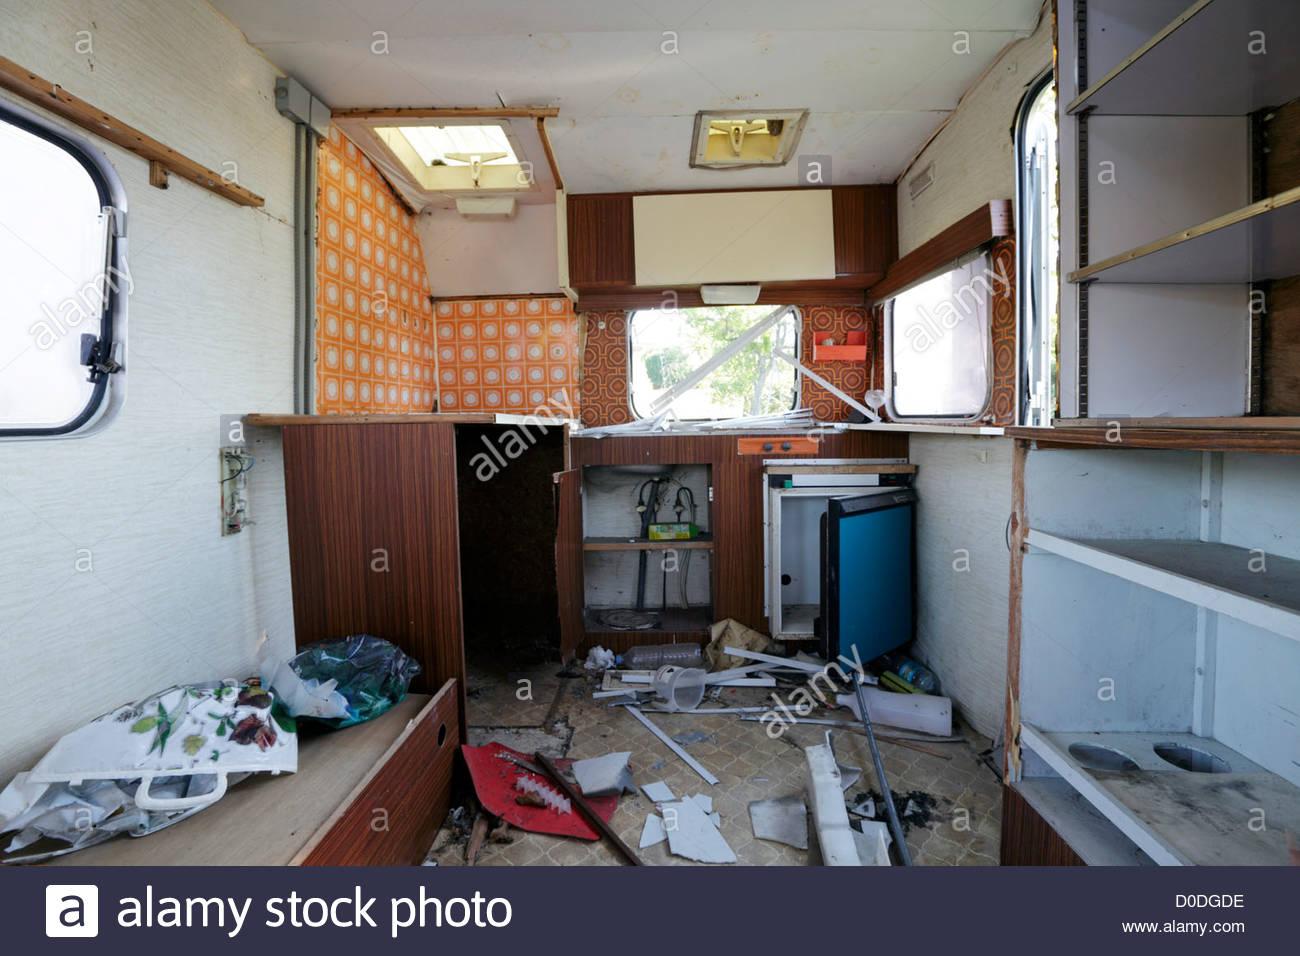 Damaged Mobile Home Inside Ruin Stock Photos Damaged Mobile Home